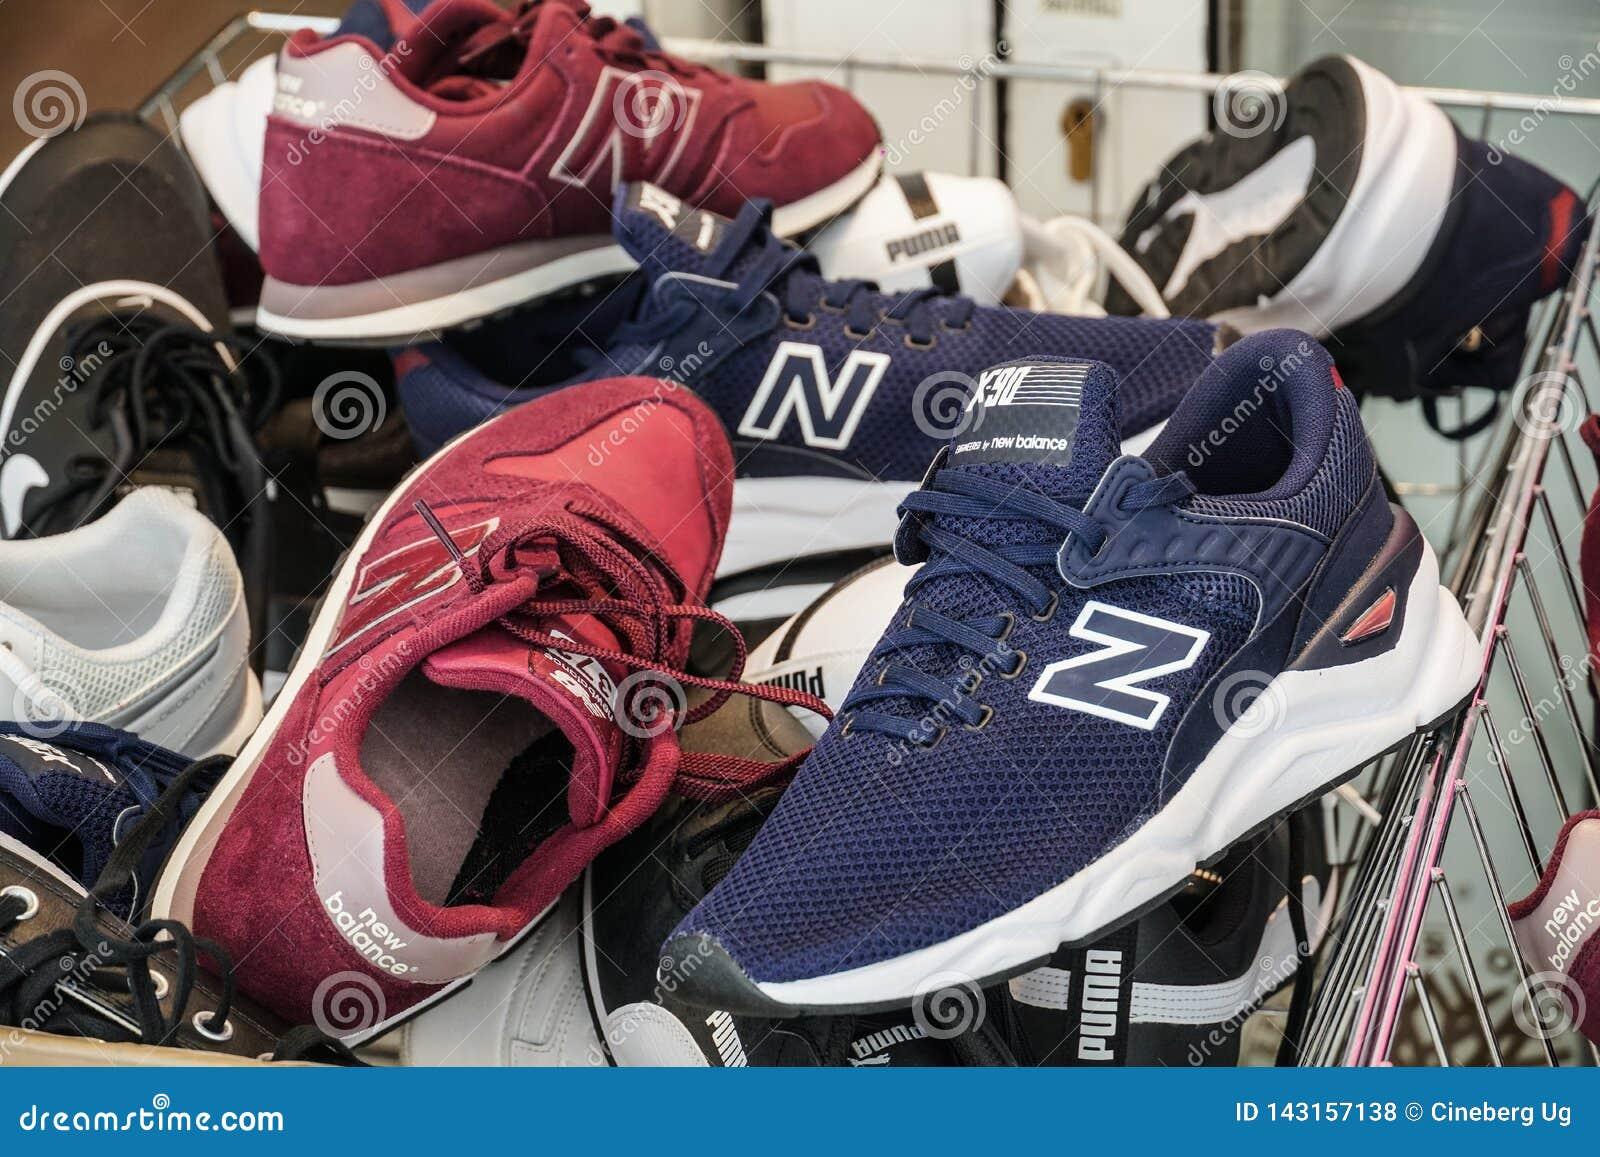 new balance athletics inc, OFF 76